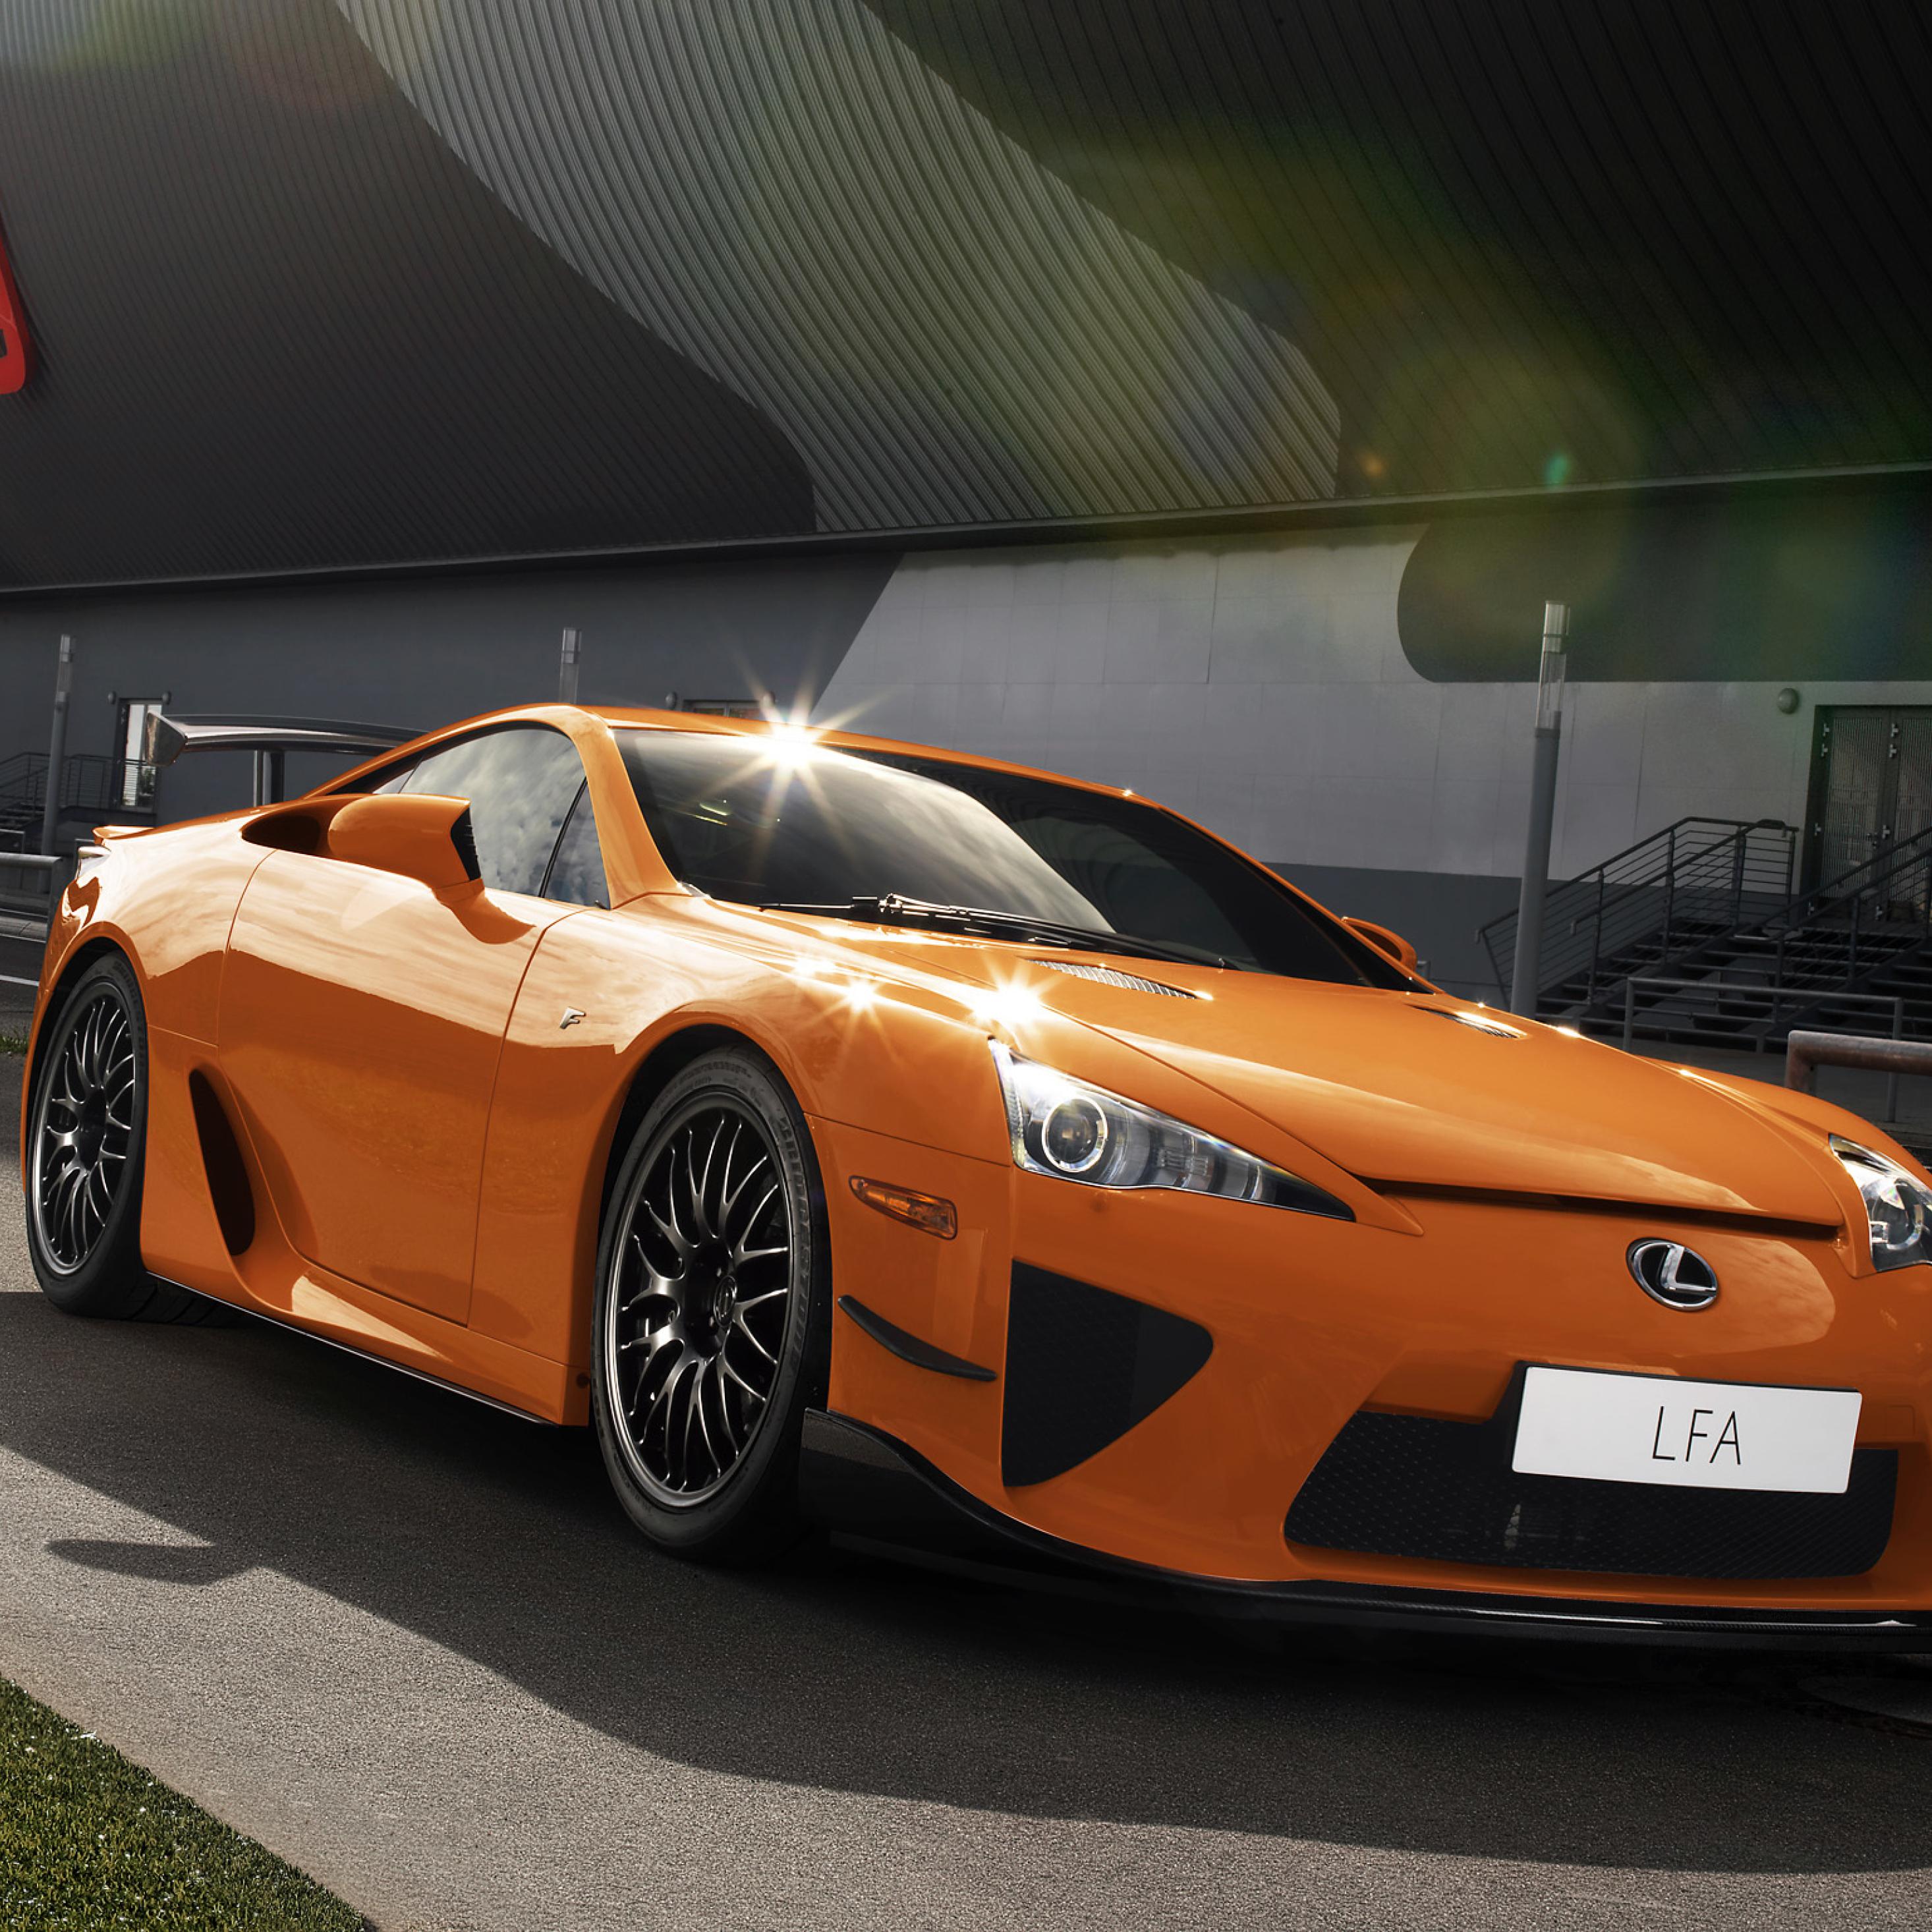 Lexus Lfa: 2932x2932 Lexus, Lfa, Orange Ipad Pro Retina Display